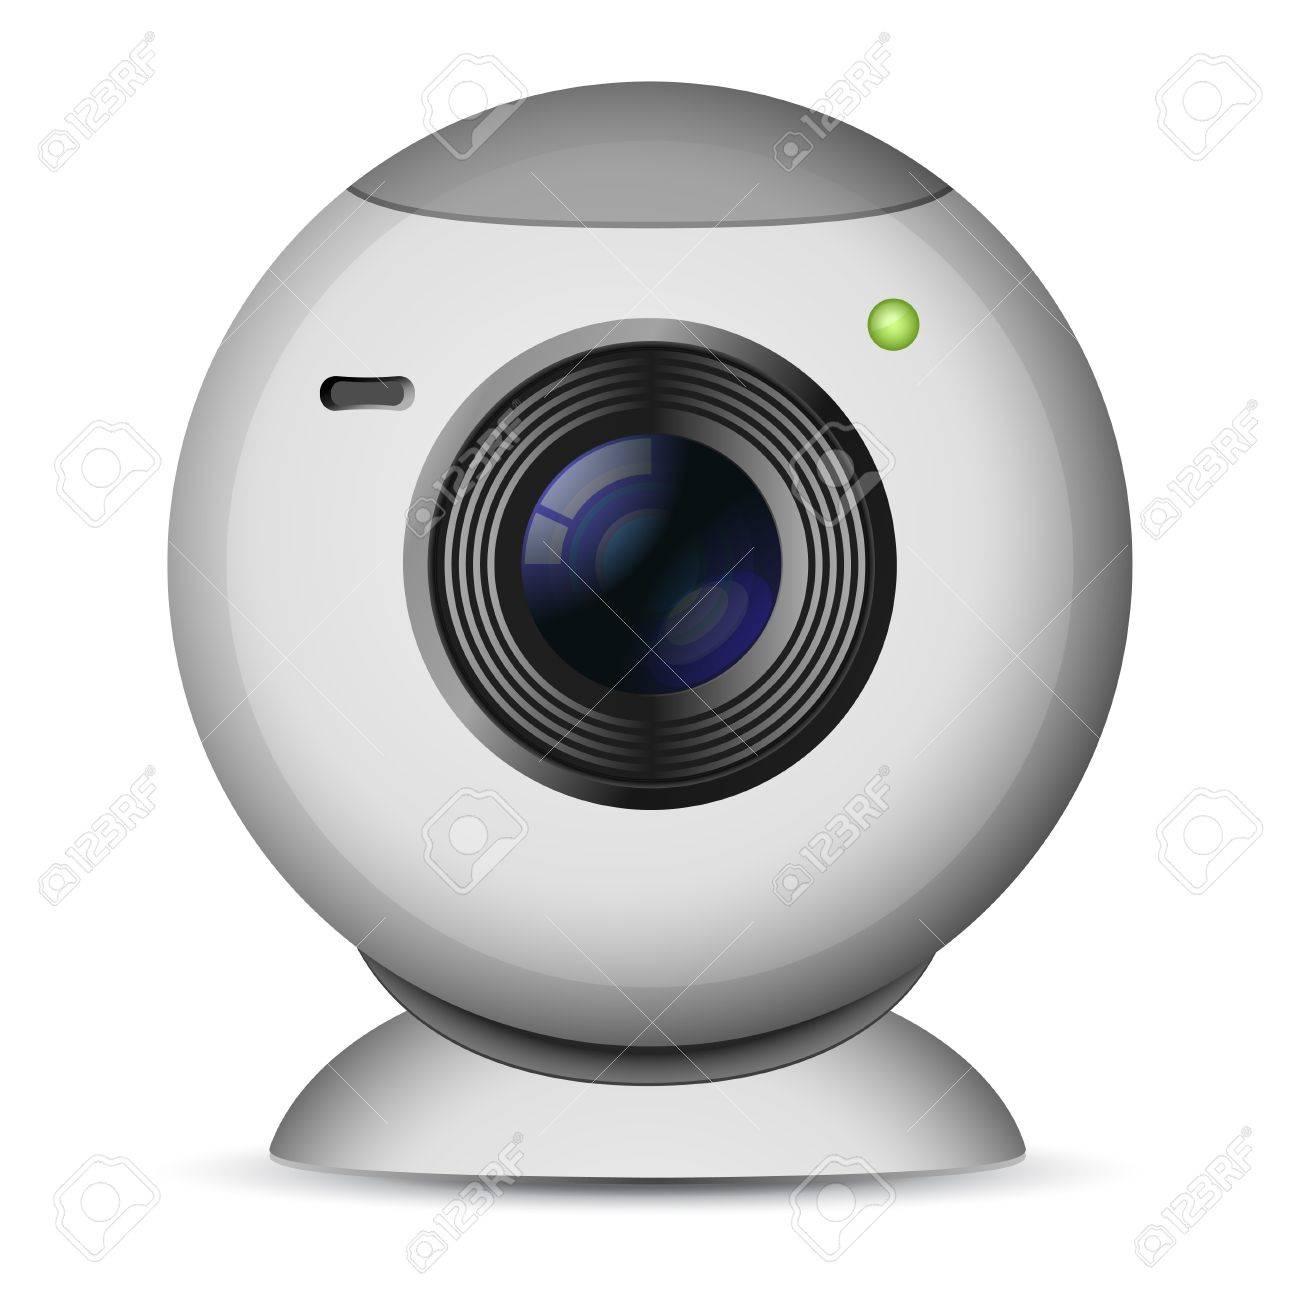 web カメラの図 ロイヤリティフリークリップアート、ベクター、ストック